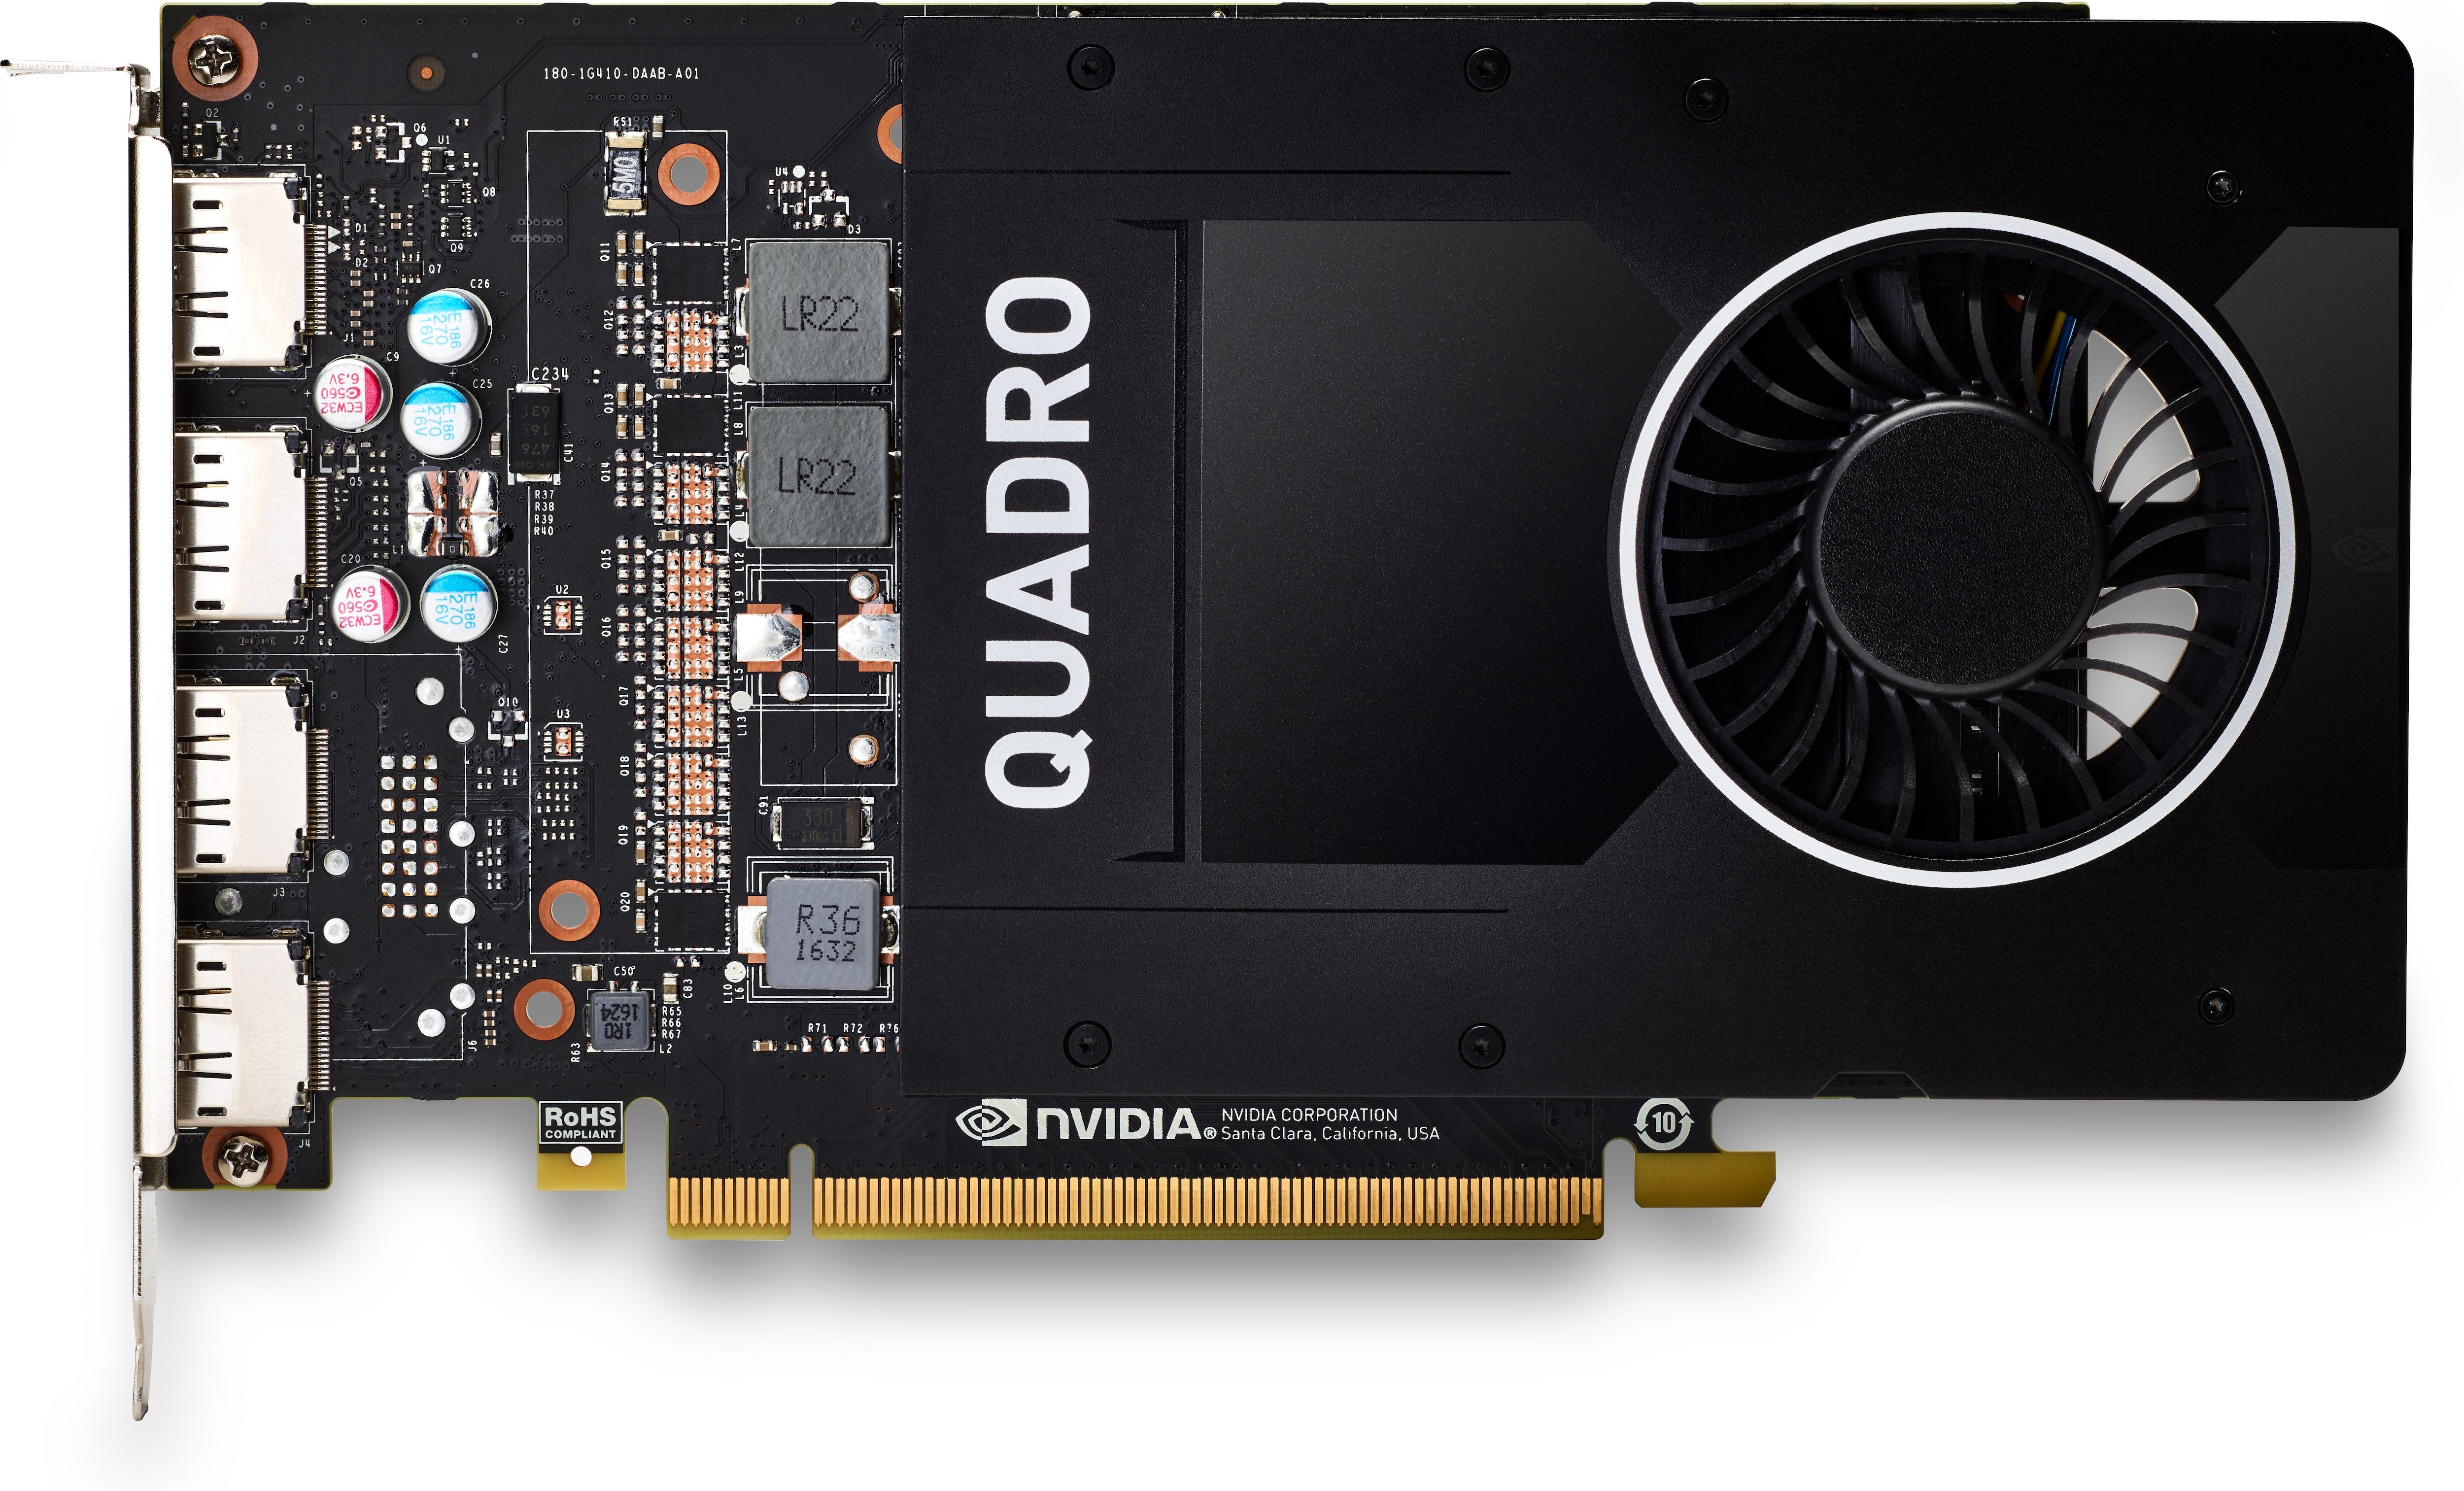 HP NVIDIA Quadro P2200 - Grafikkarten - Quadro P2200 - 5 GB GDDR5X - PCIe 3.0 x16 - 4 x DisplayPort - f?r Workstation Z2